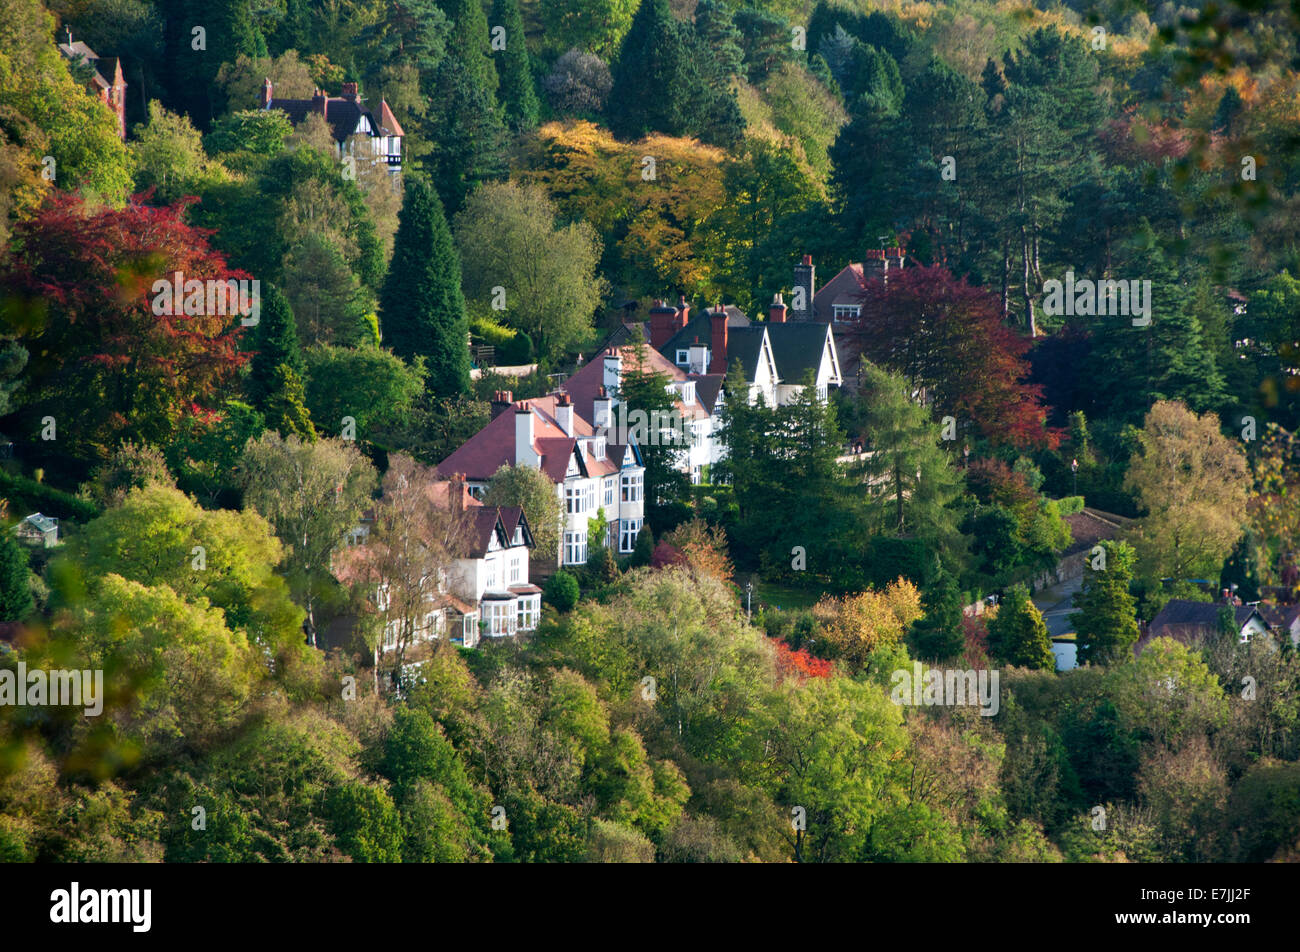 Autumn Colours at Nether Padley,Peak District National Park, Derbyshire, England, UK - Stock Image